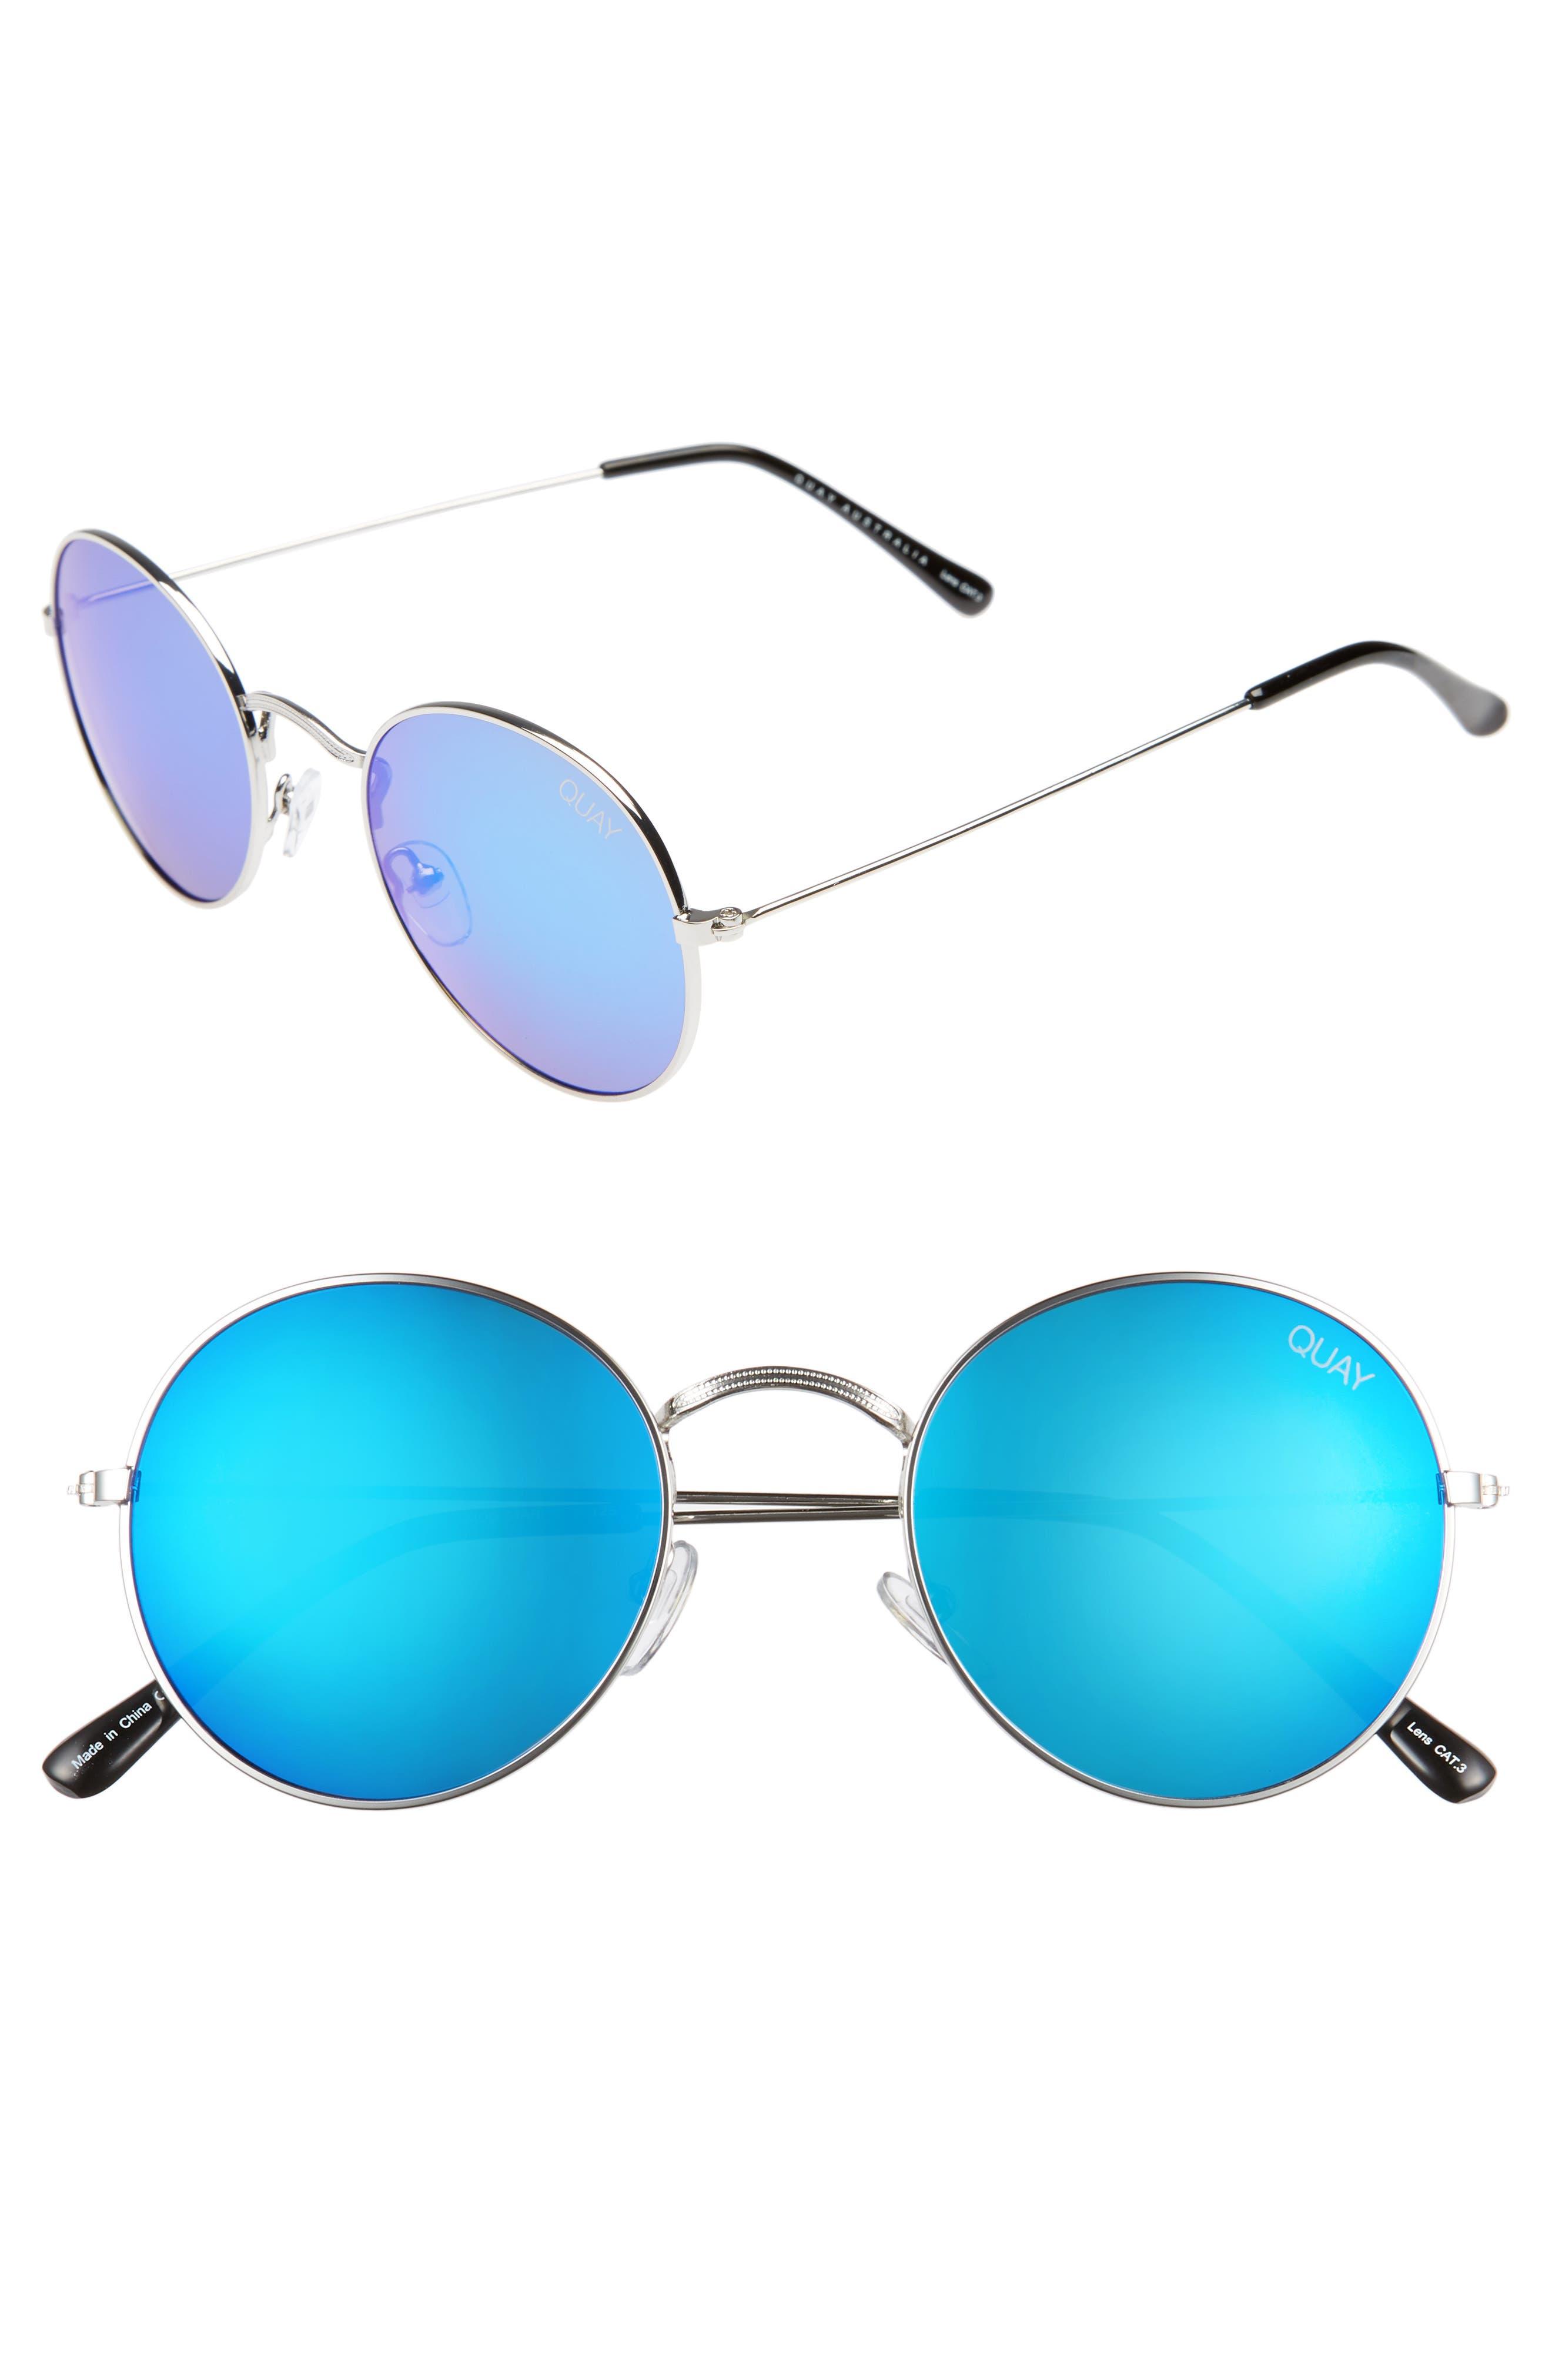 Quay Australia 50mm Mod Star Round Sunglasses